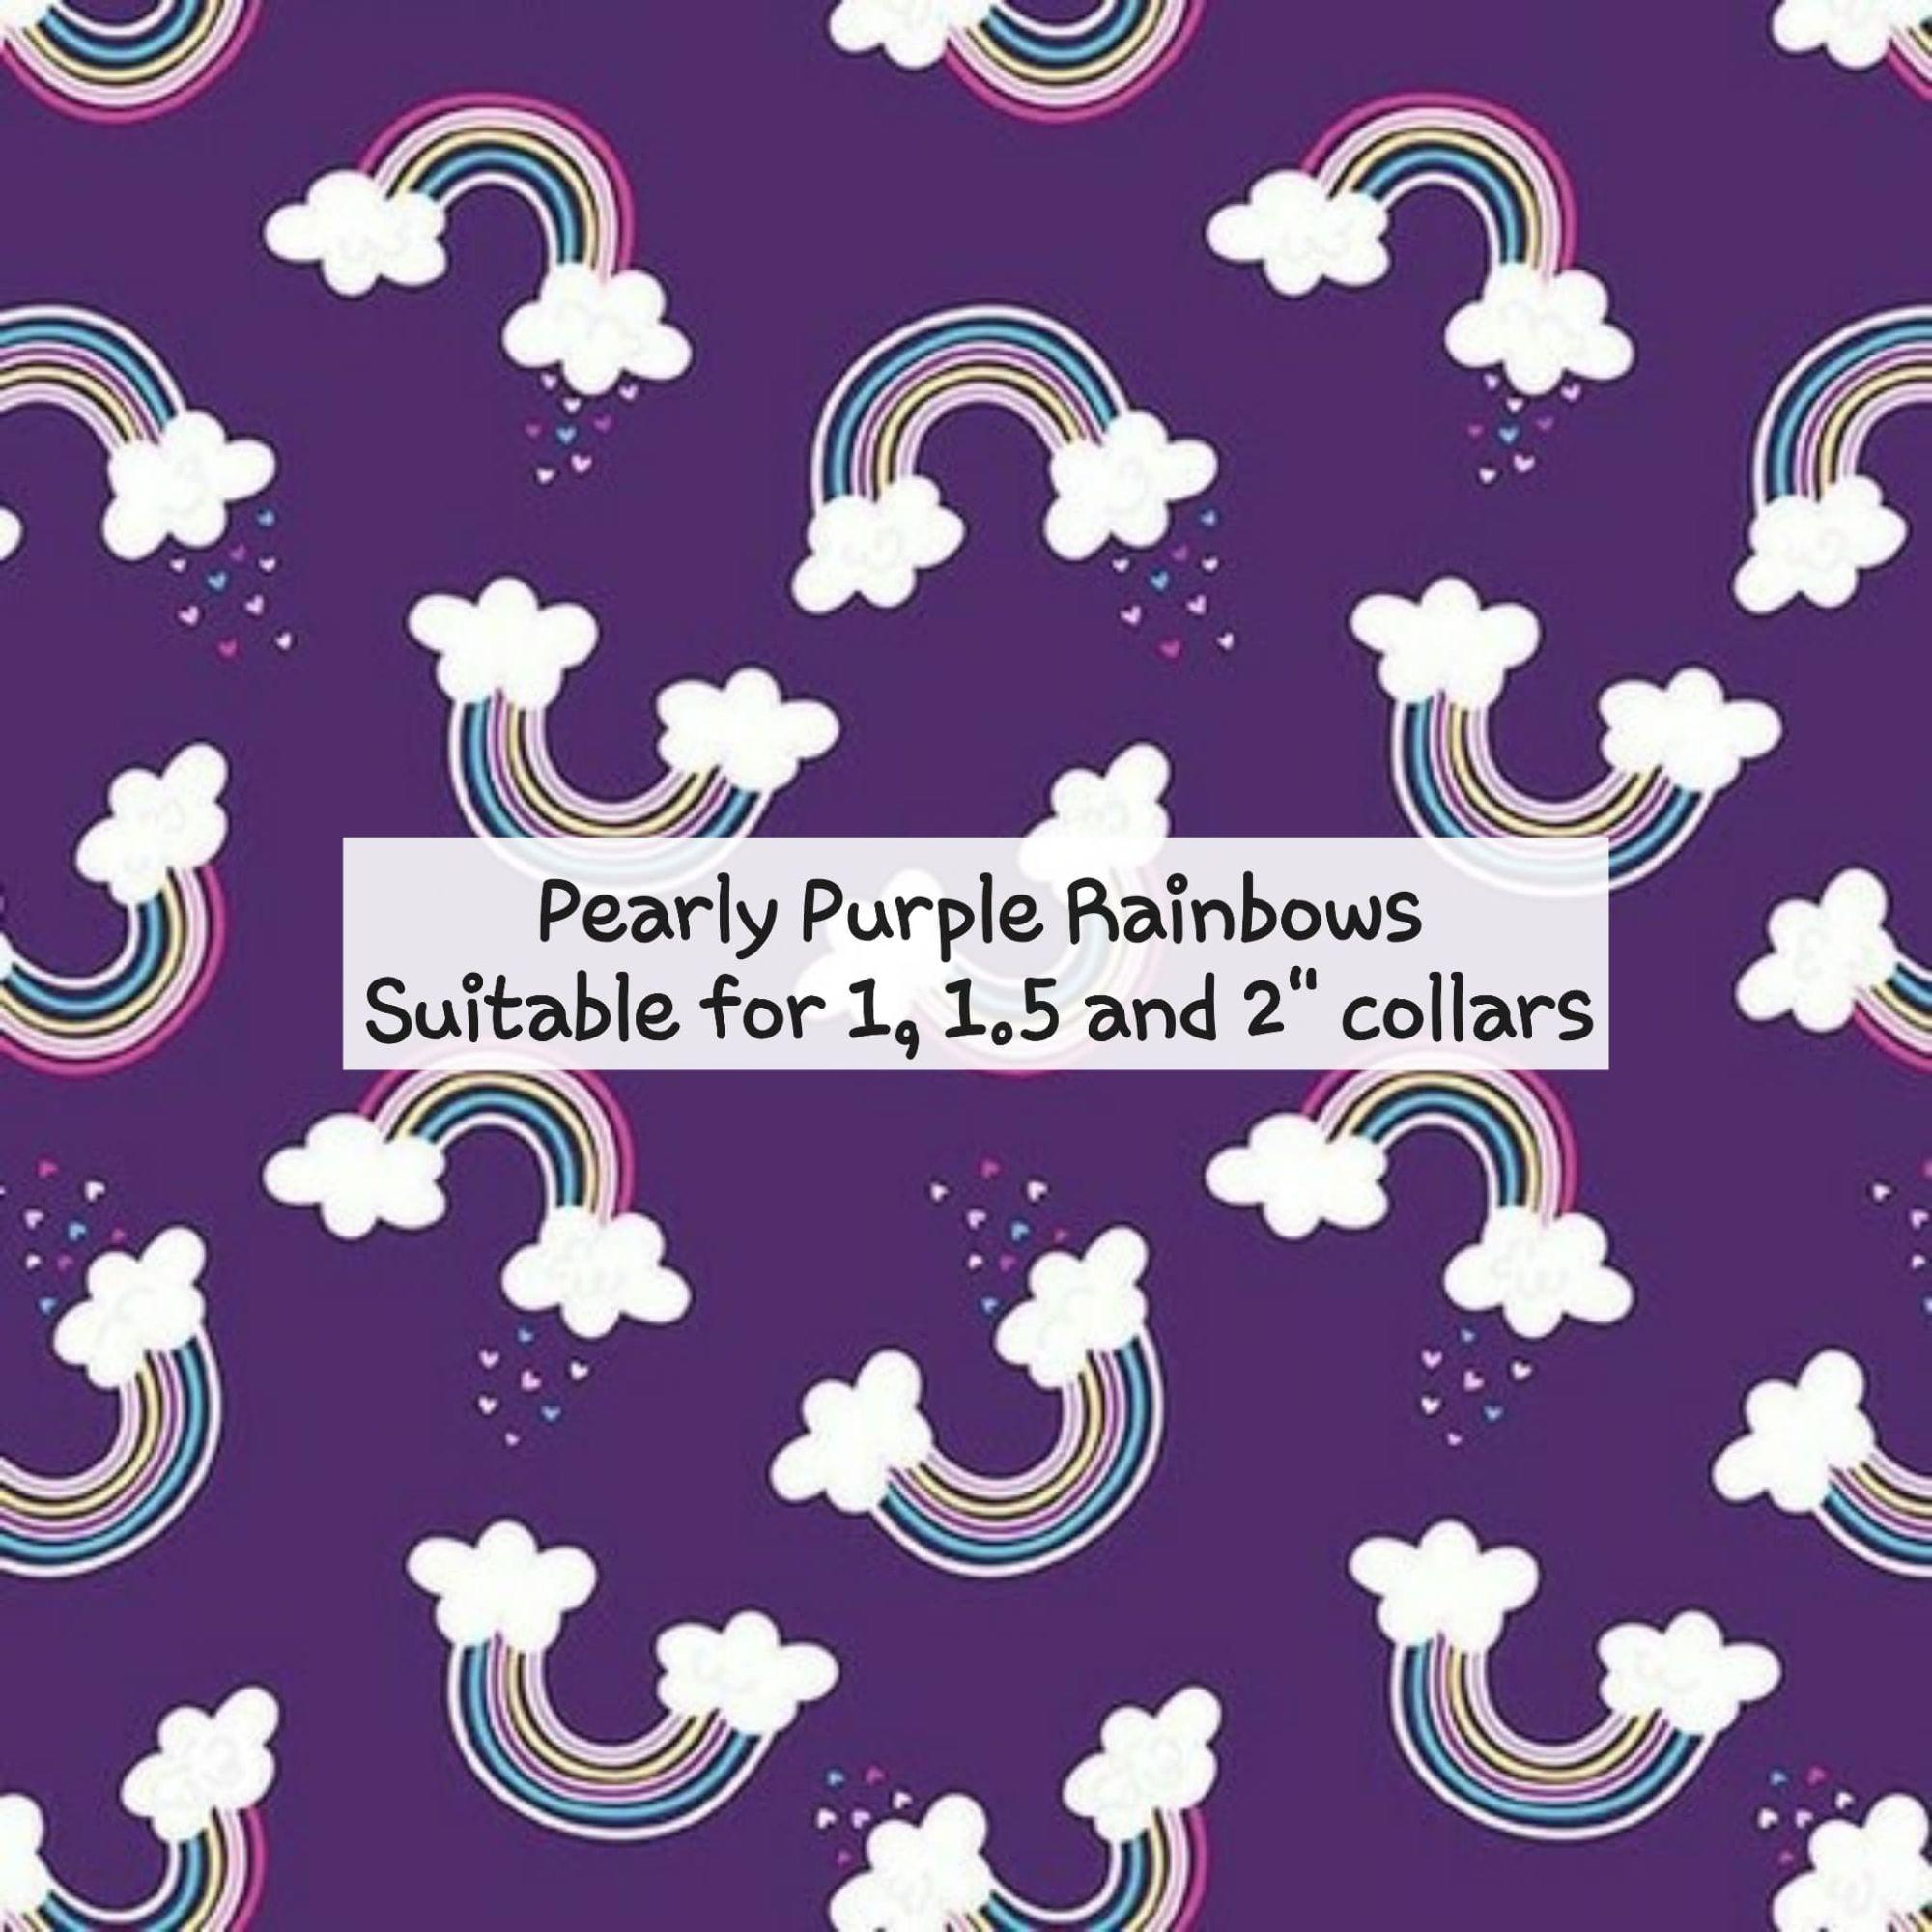 Pearly Purple Rainbows